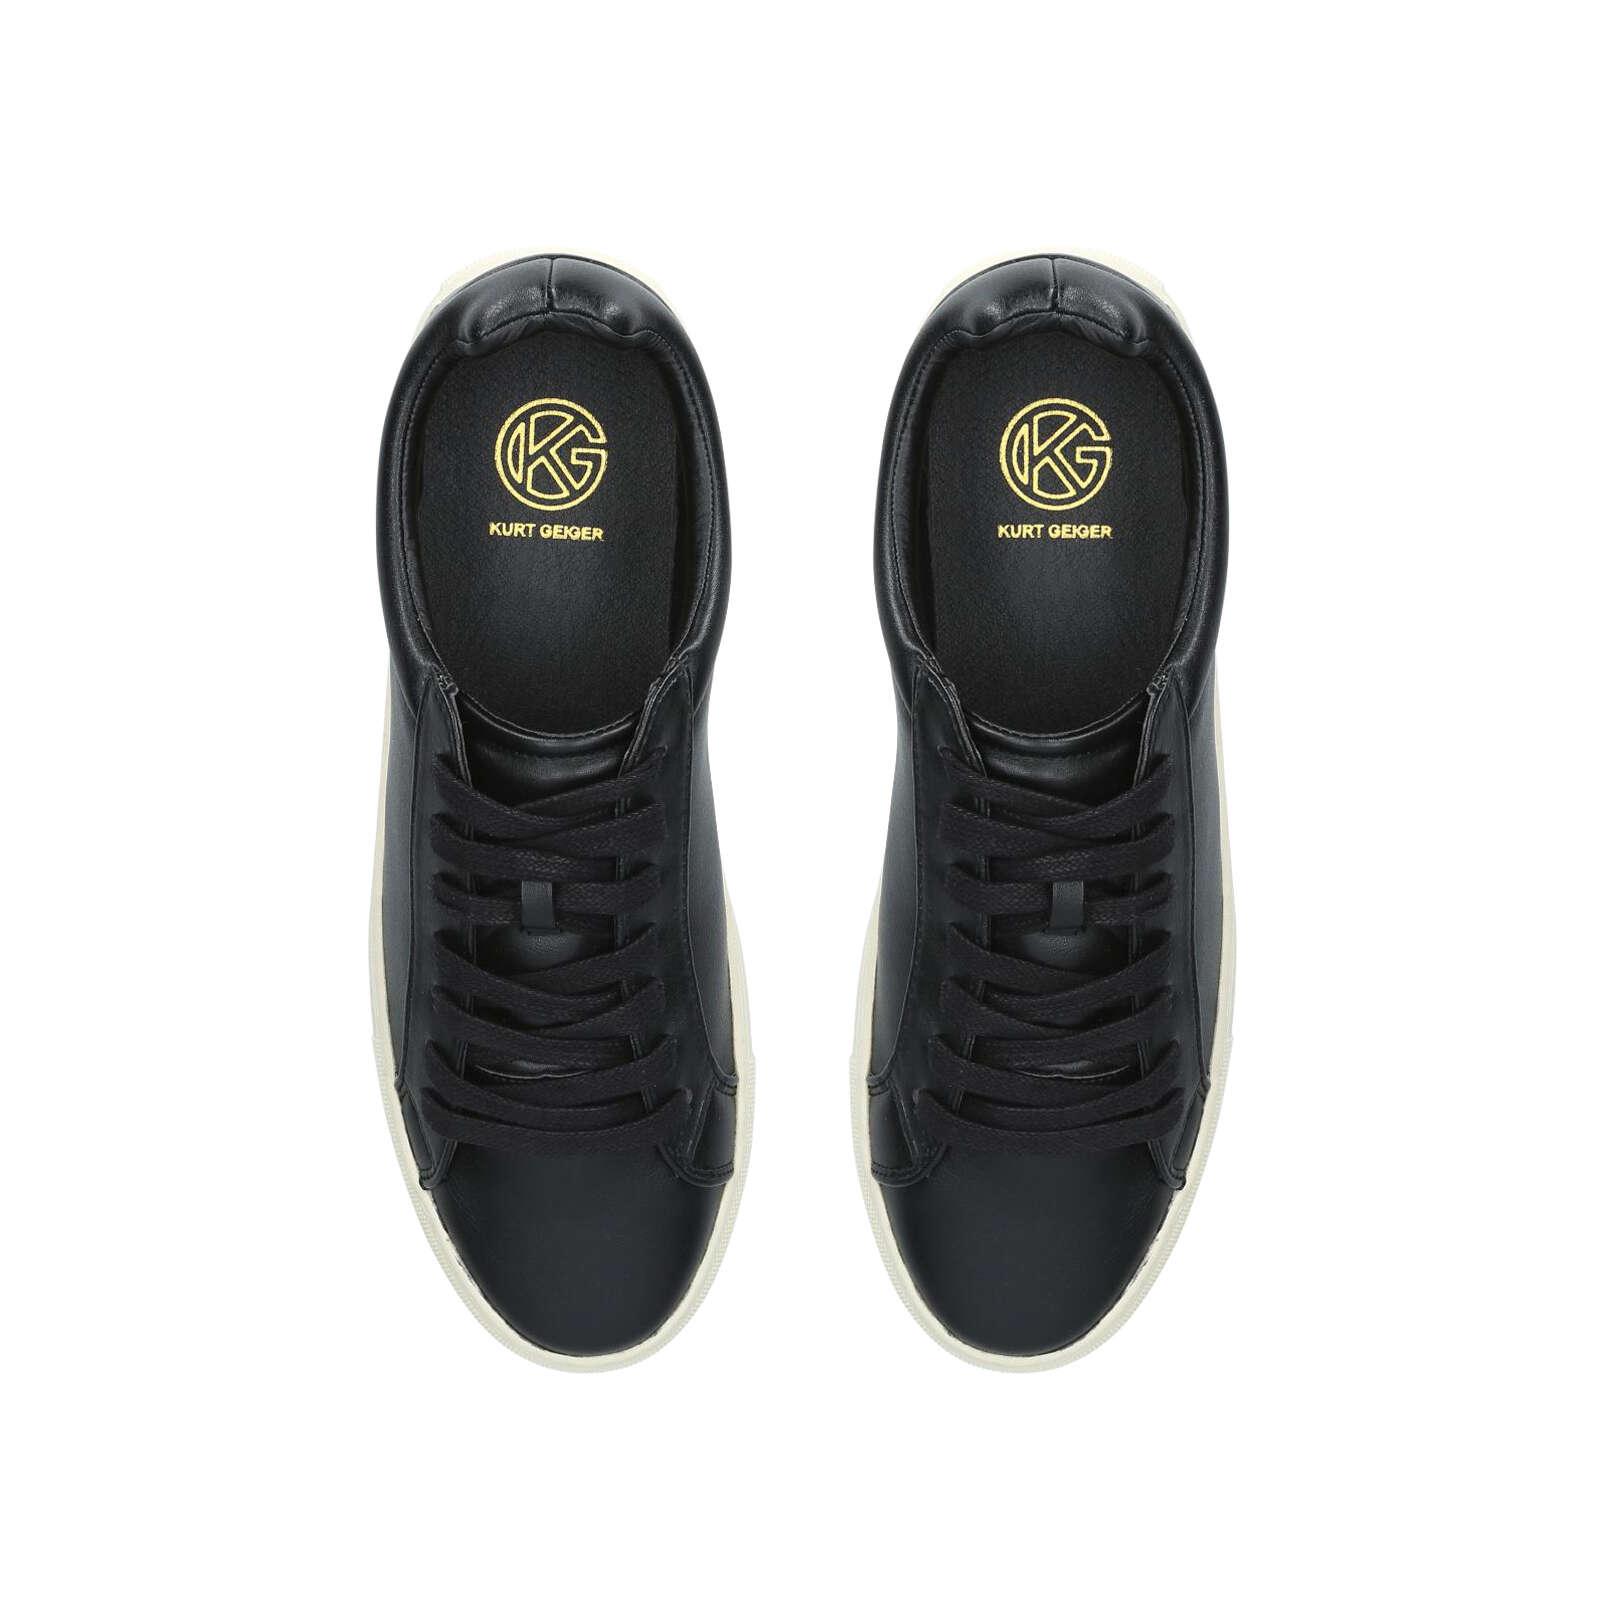 WAREHAM - KG KURT GEIGER Sneakers